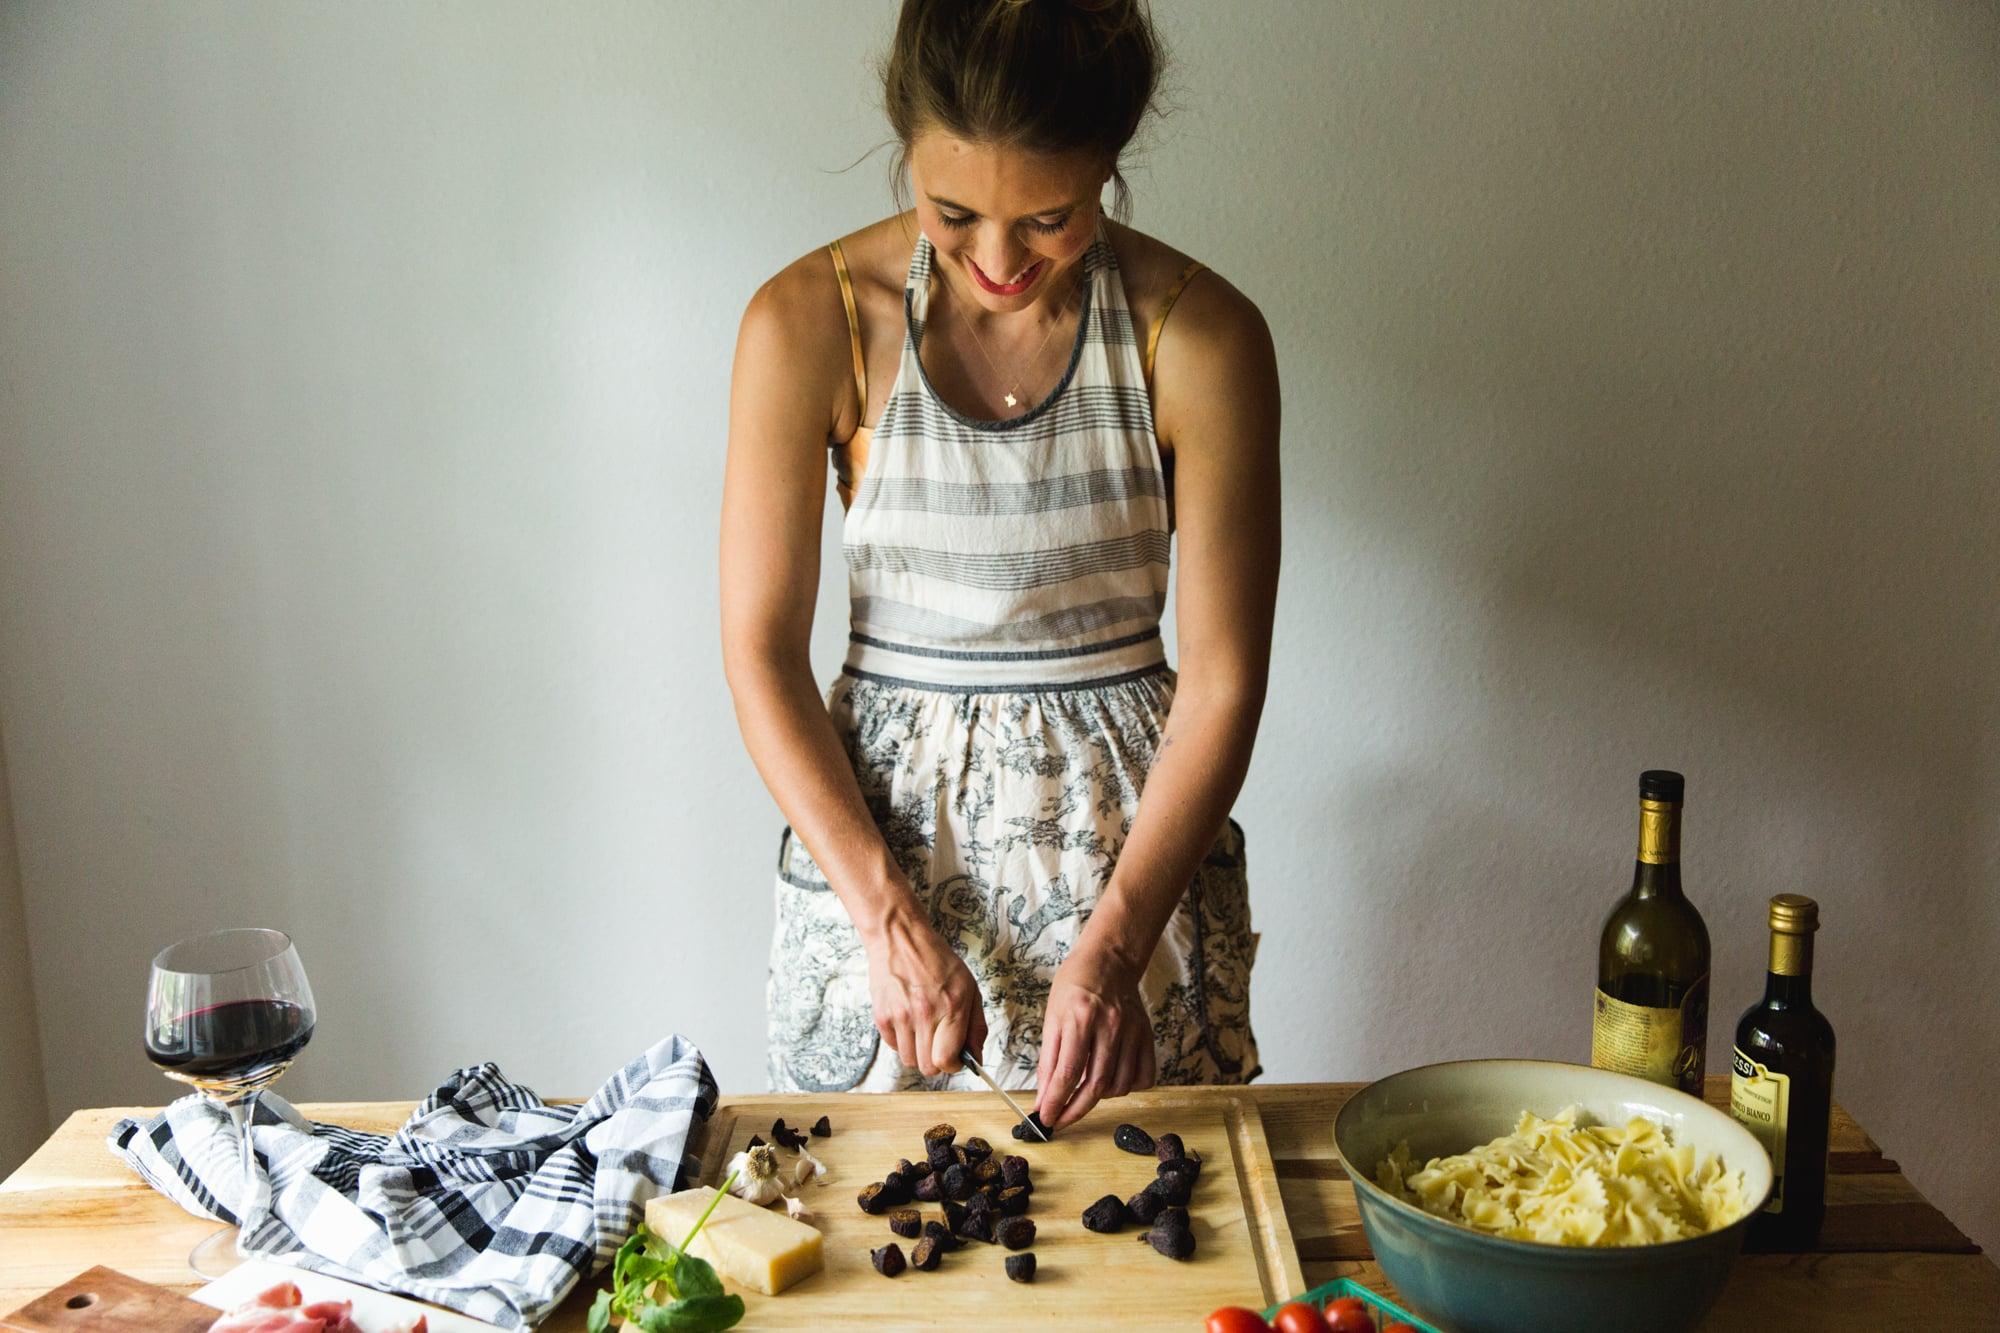 fig-prosciutto-pasta-salad-recipe-6.jpg